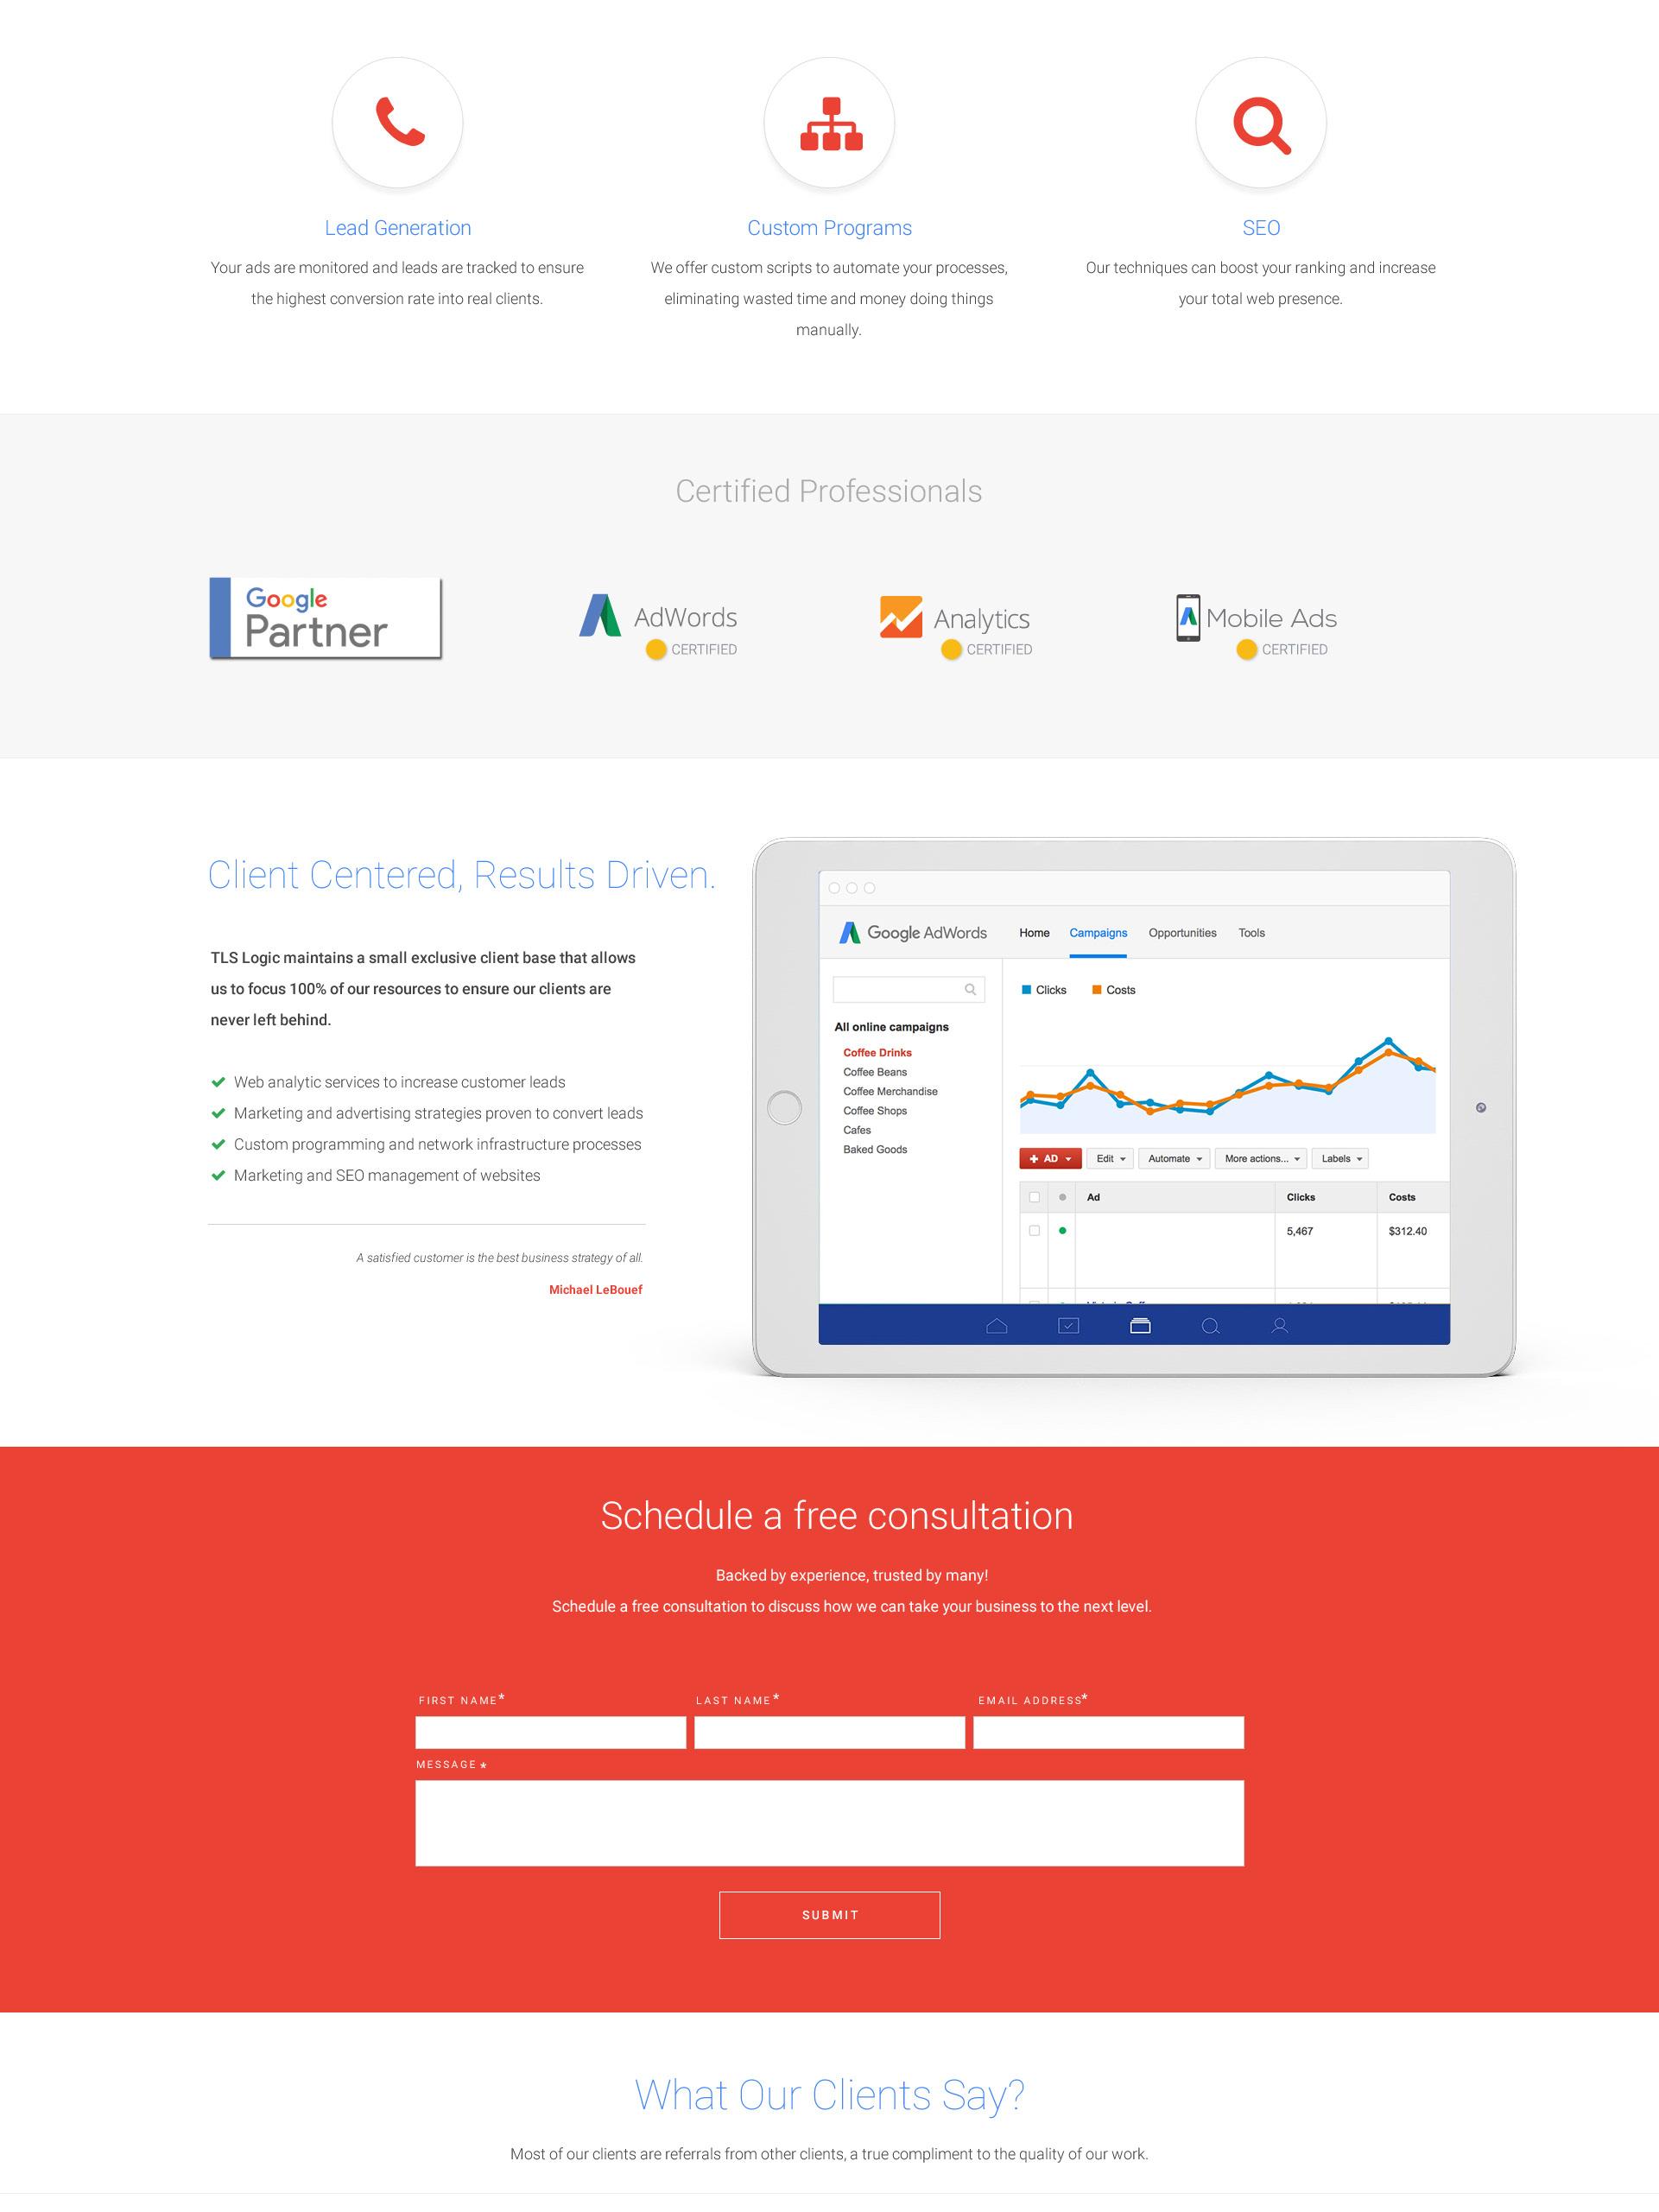 Glen Factor - Pumping Website Design Mockup